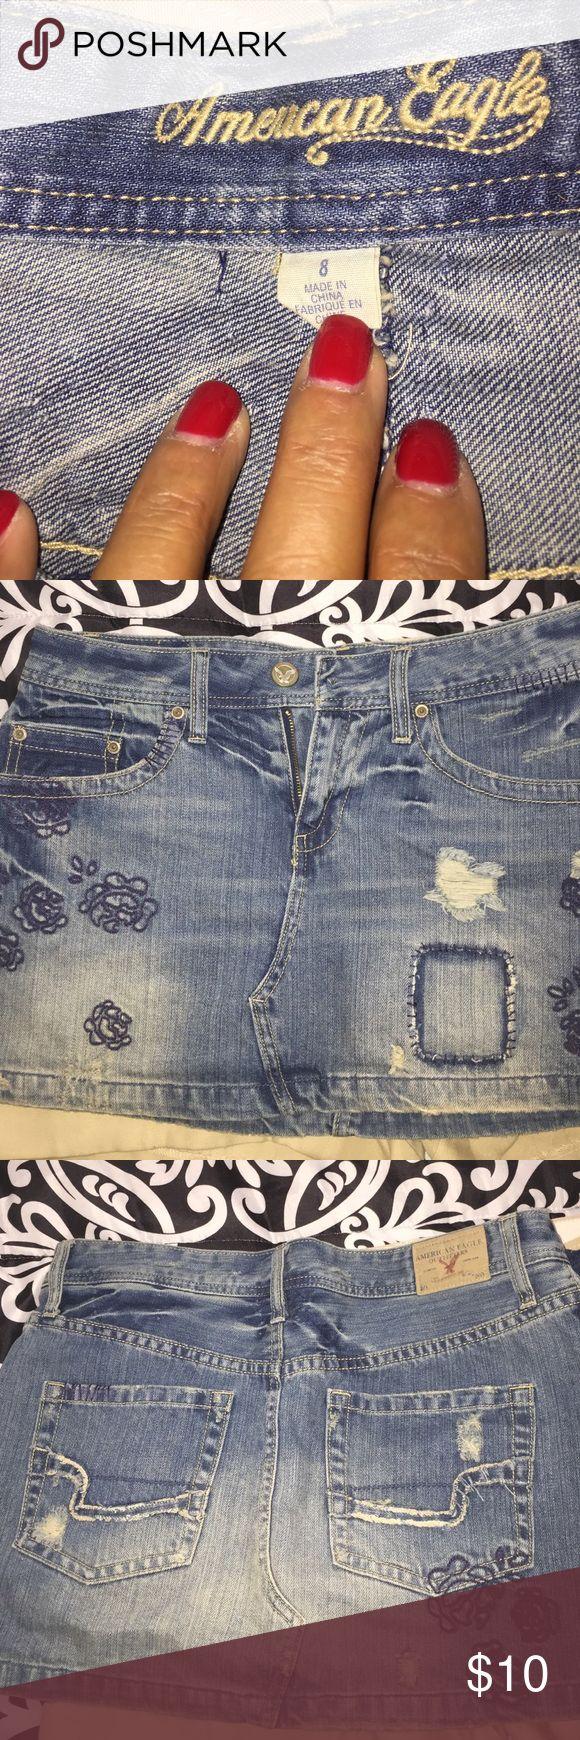 EUC Distressed jean skirt American Eagle distressed jean mini skirt. Super cute. American Eagle Outfitters Skirts Mini